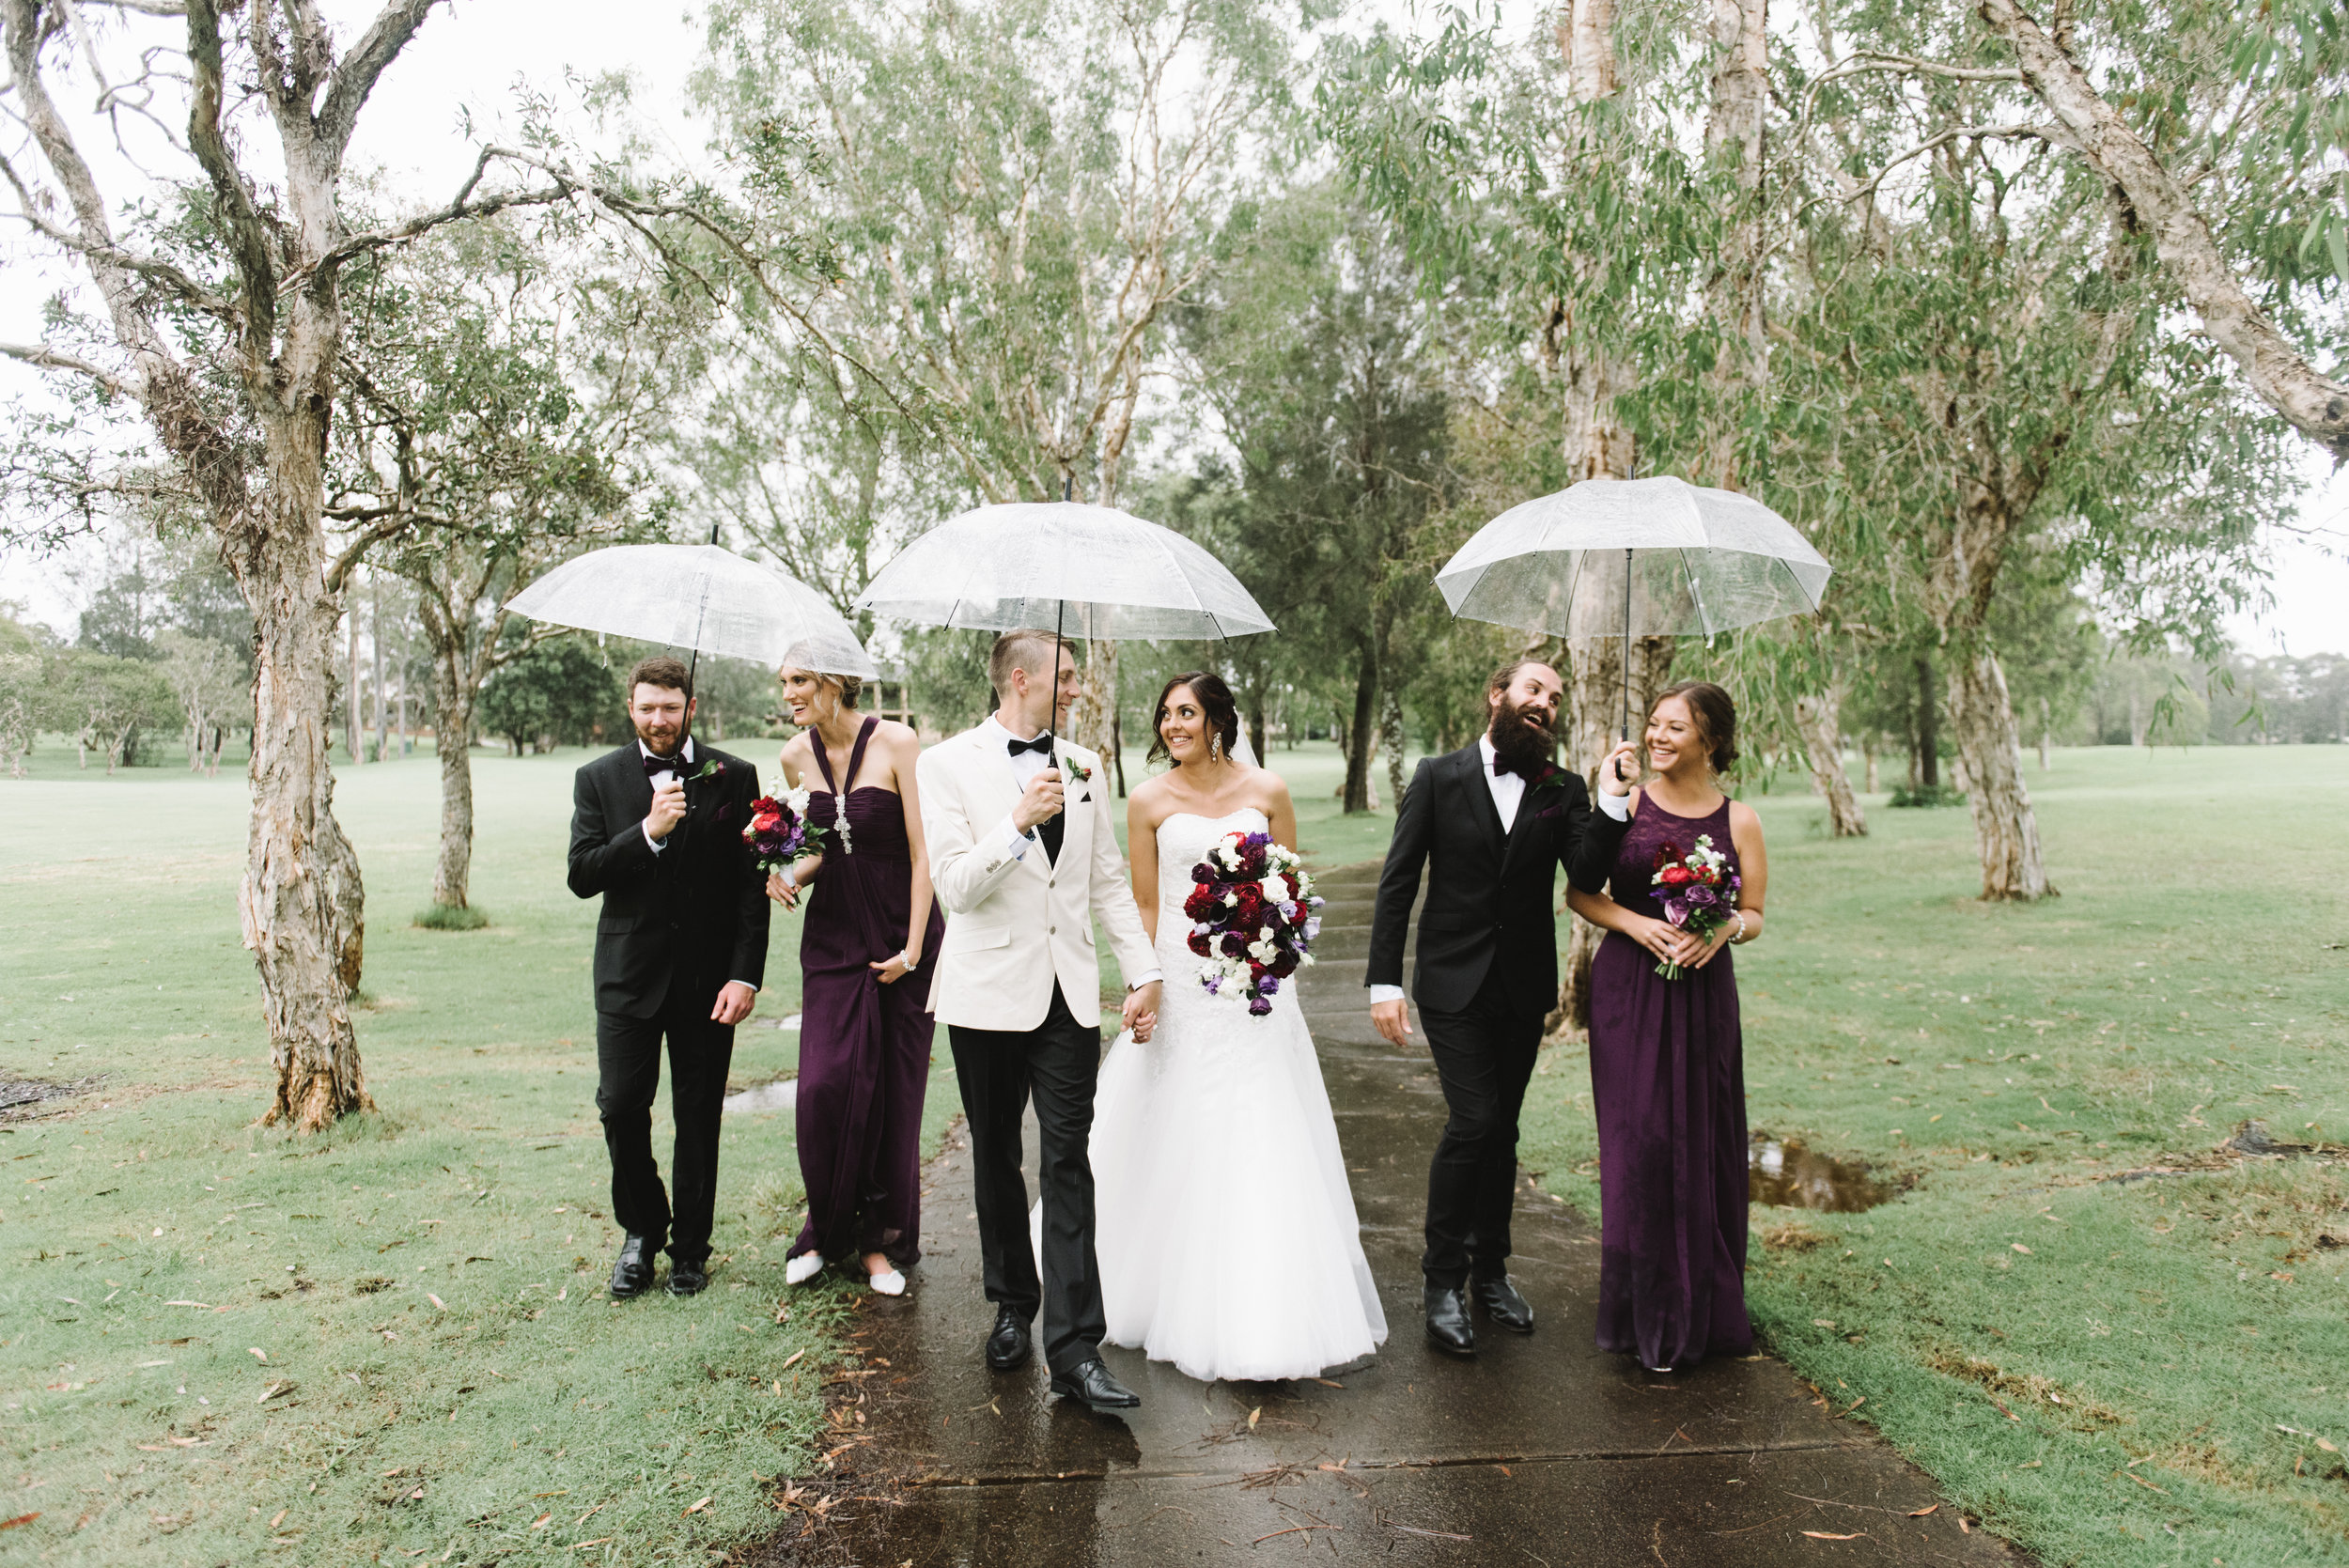 Gold-Coast-Arundel-Hills-Country-Club-Wedding-Photography-30.jpg